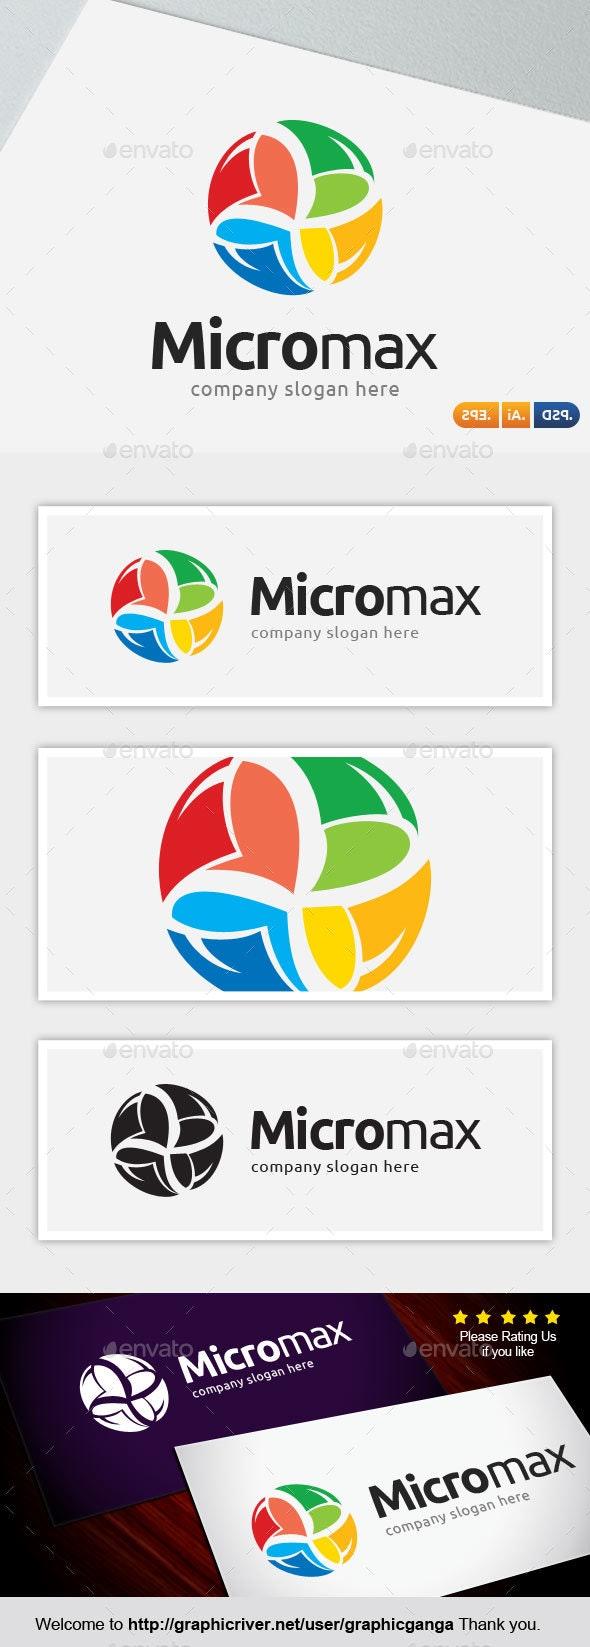 MicroMax - Abstract Logo Templates